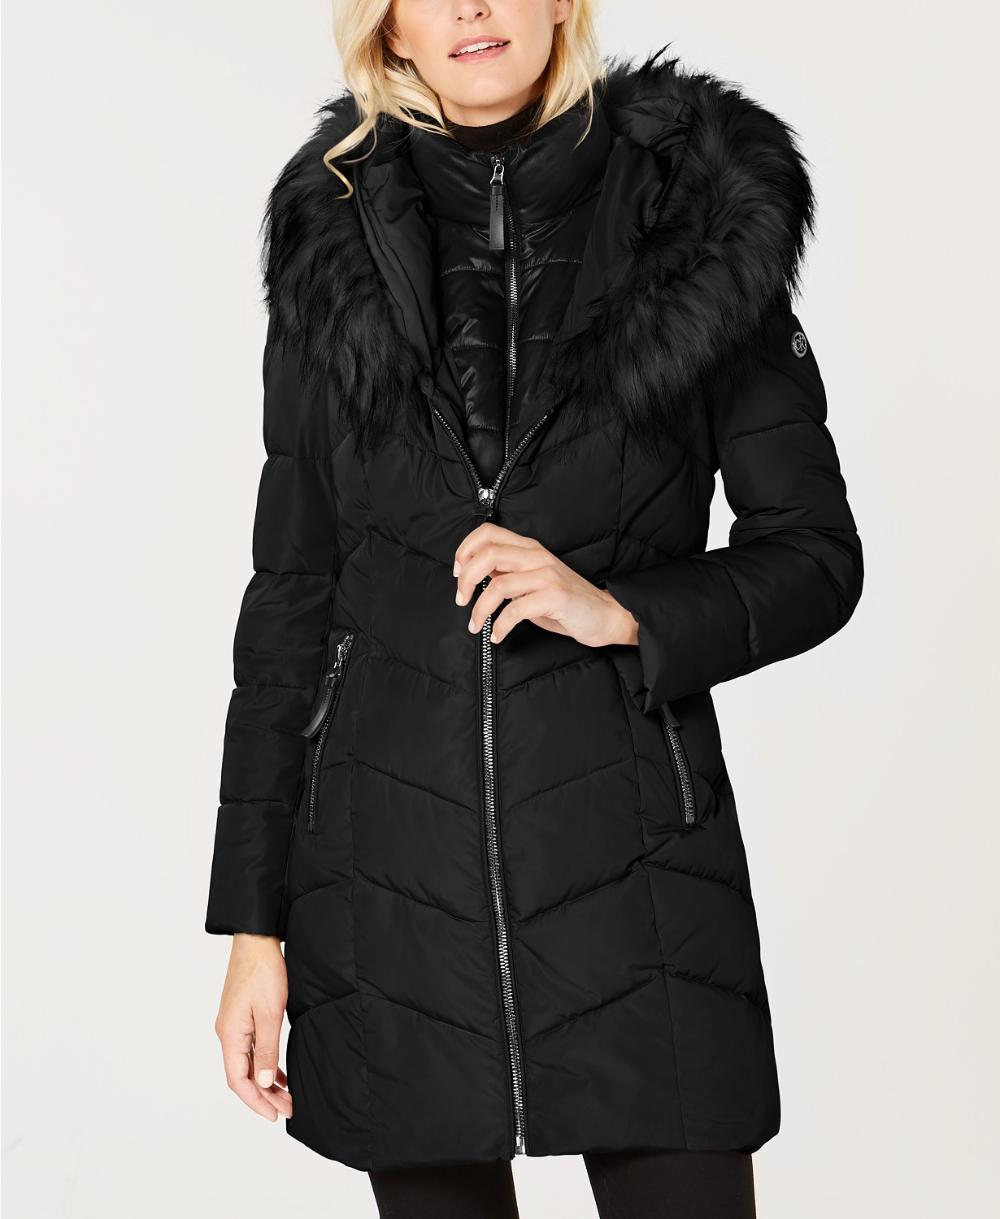 Calvin Klein Petite Faux Fur Trim Hooded Puffer Coat Reviews Coats Petites Macy S Women S Puffer Coats Puffer Coat Hooded Faux [ 1219 x 1000 Pixel ]